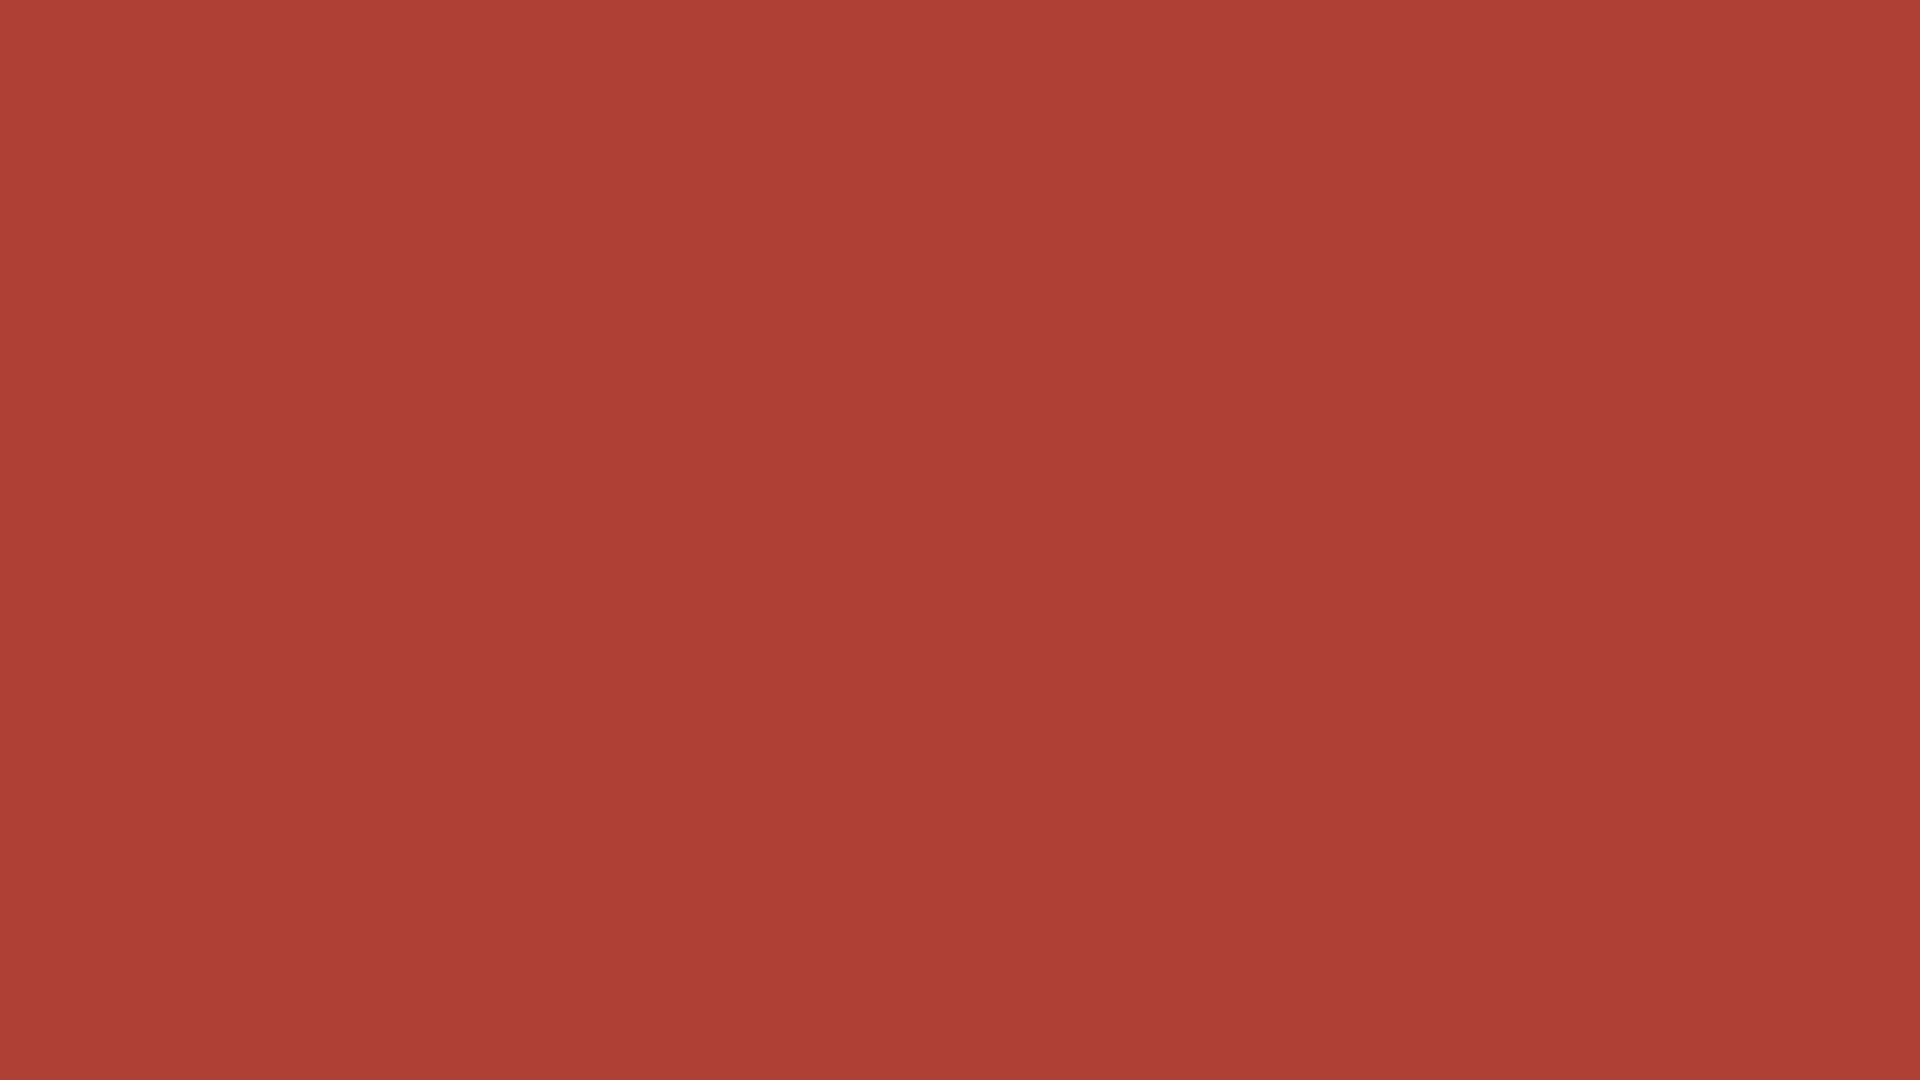 1920x1080 Pale Carmine Solid Color Background